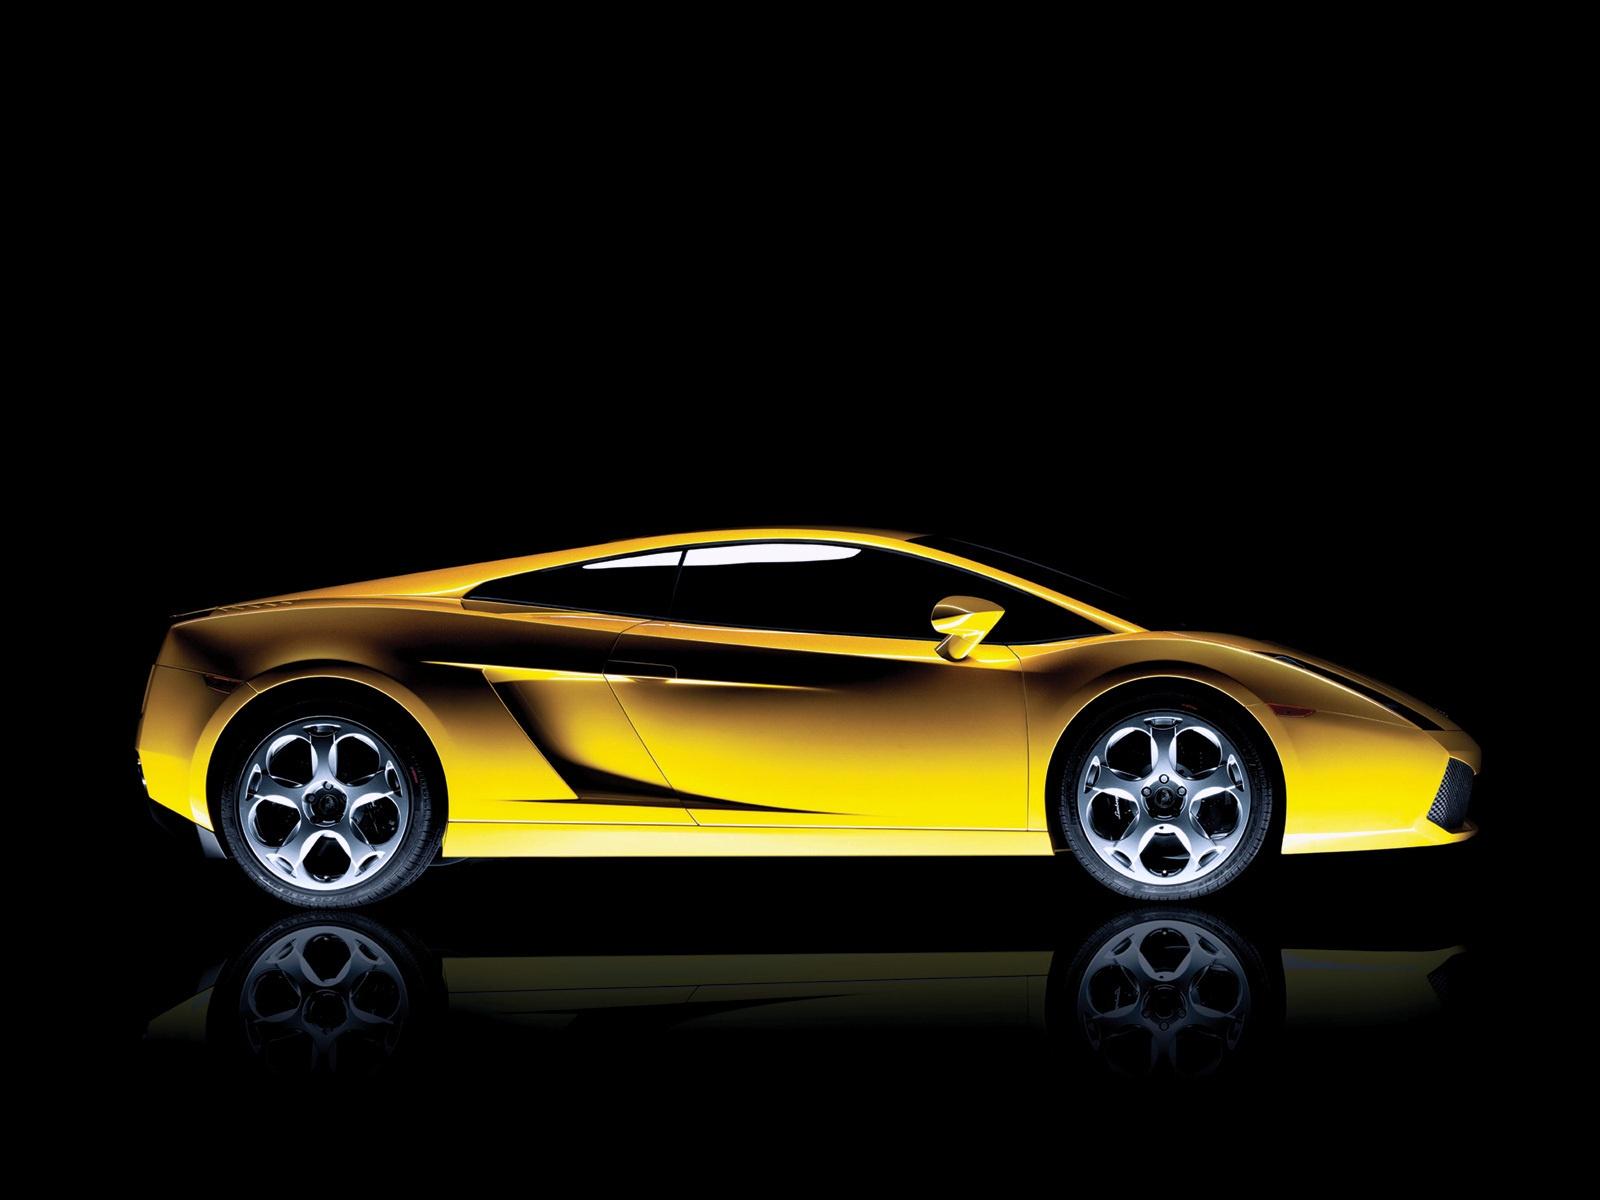 Supercars   Lamborghini Gellardo Hd Desktop Wallpaper 1600x1200